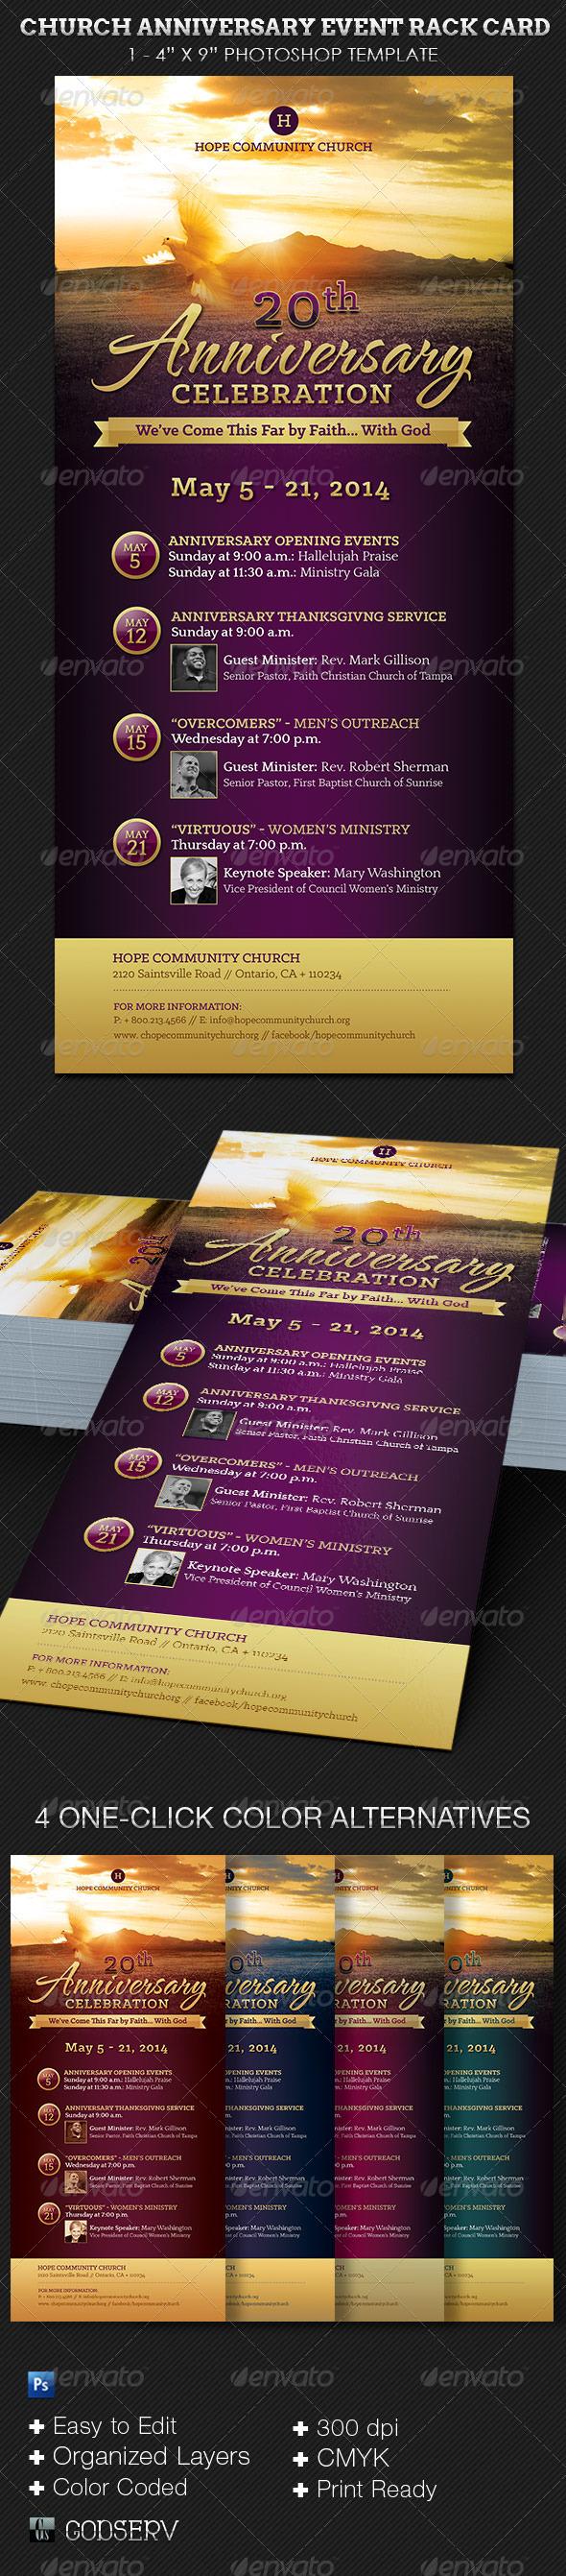 Church Anniversary Events Rack Card Template - Church Flyers